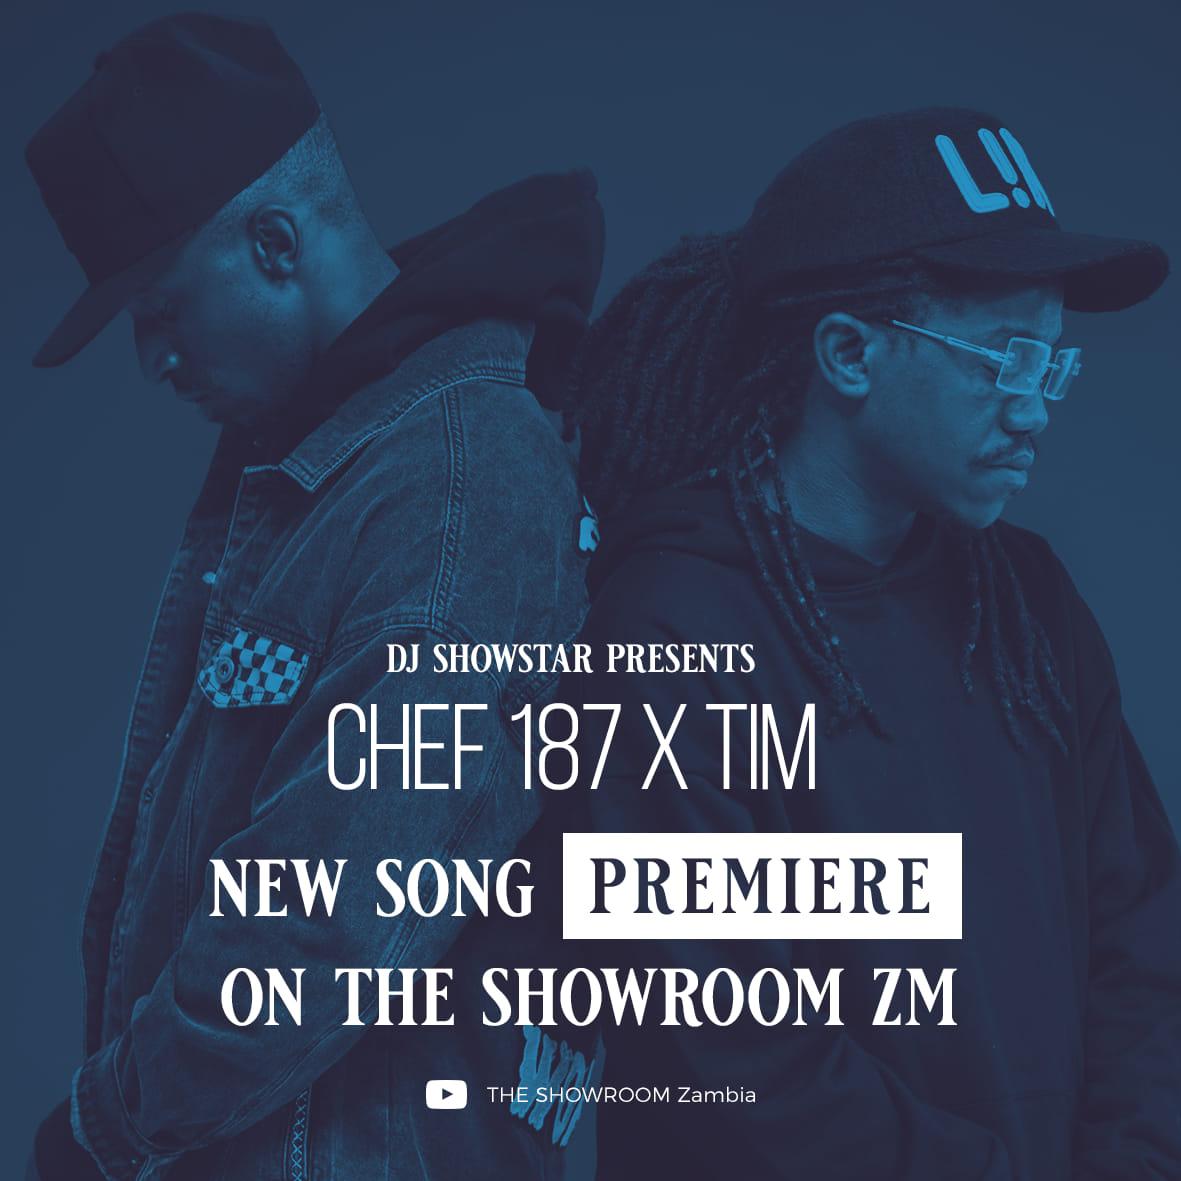 DJ Showstar ft. Tim & Chef 187 - Mwana Mfumu (The Showroom session)